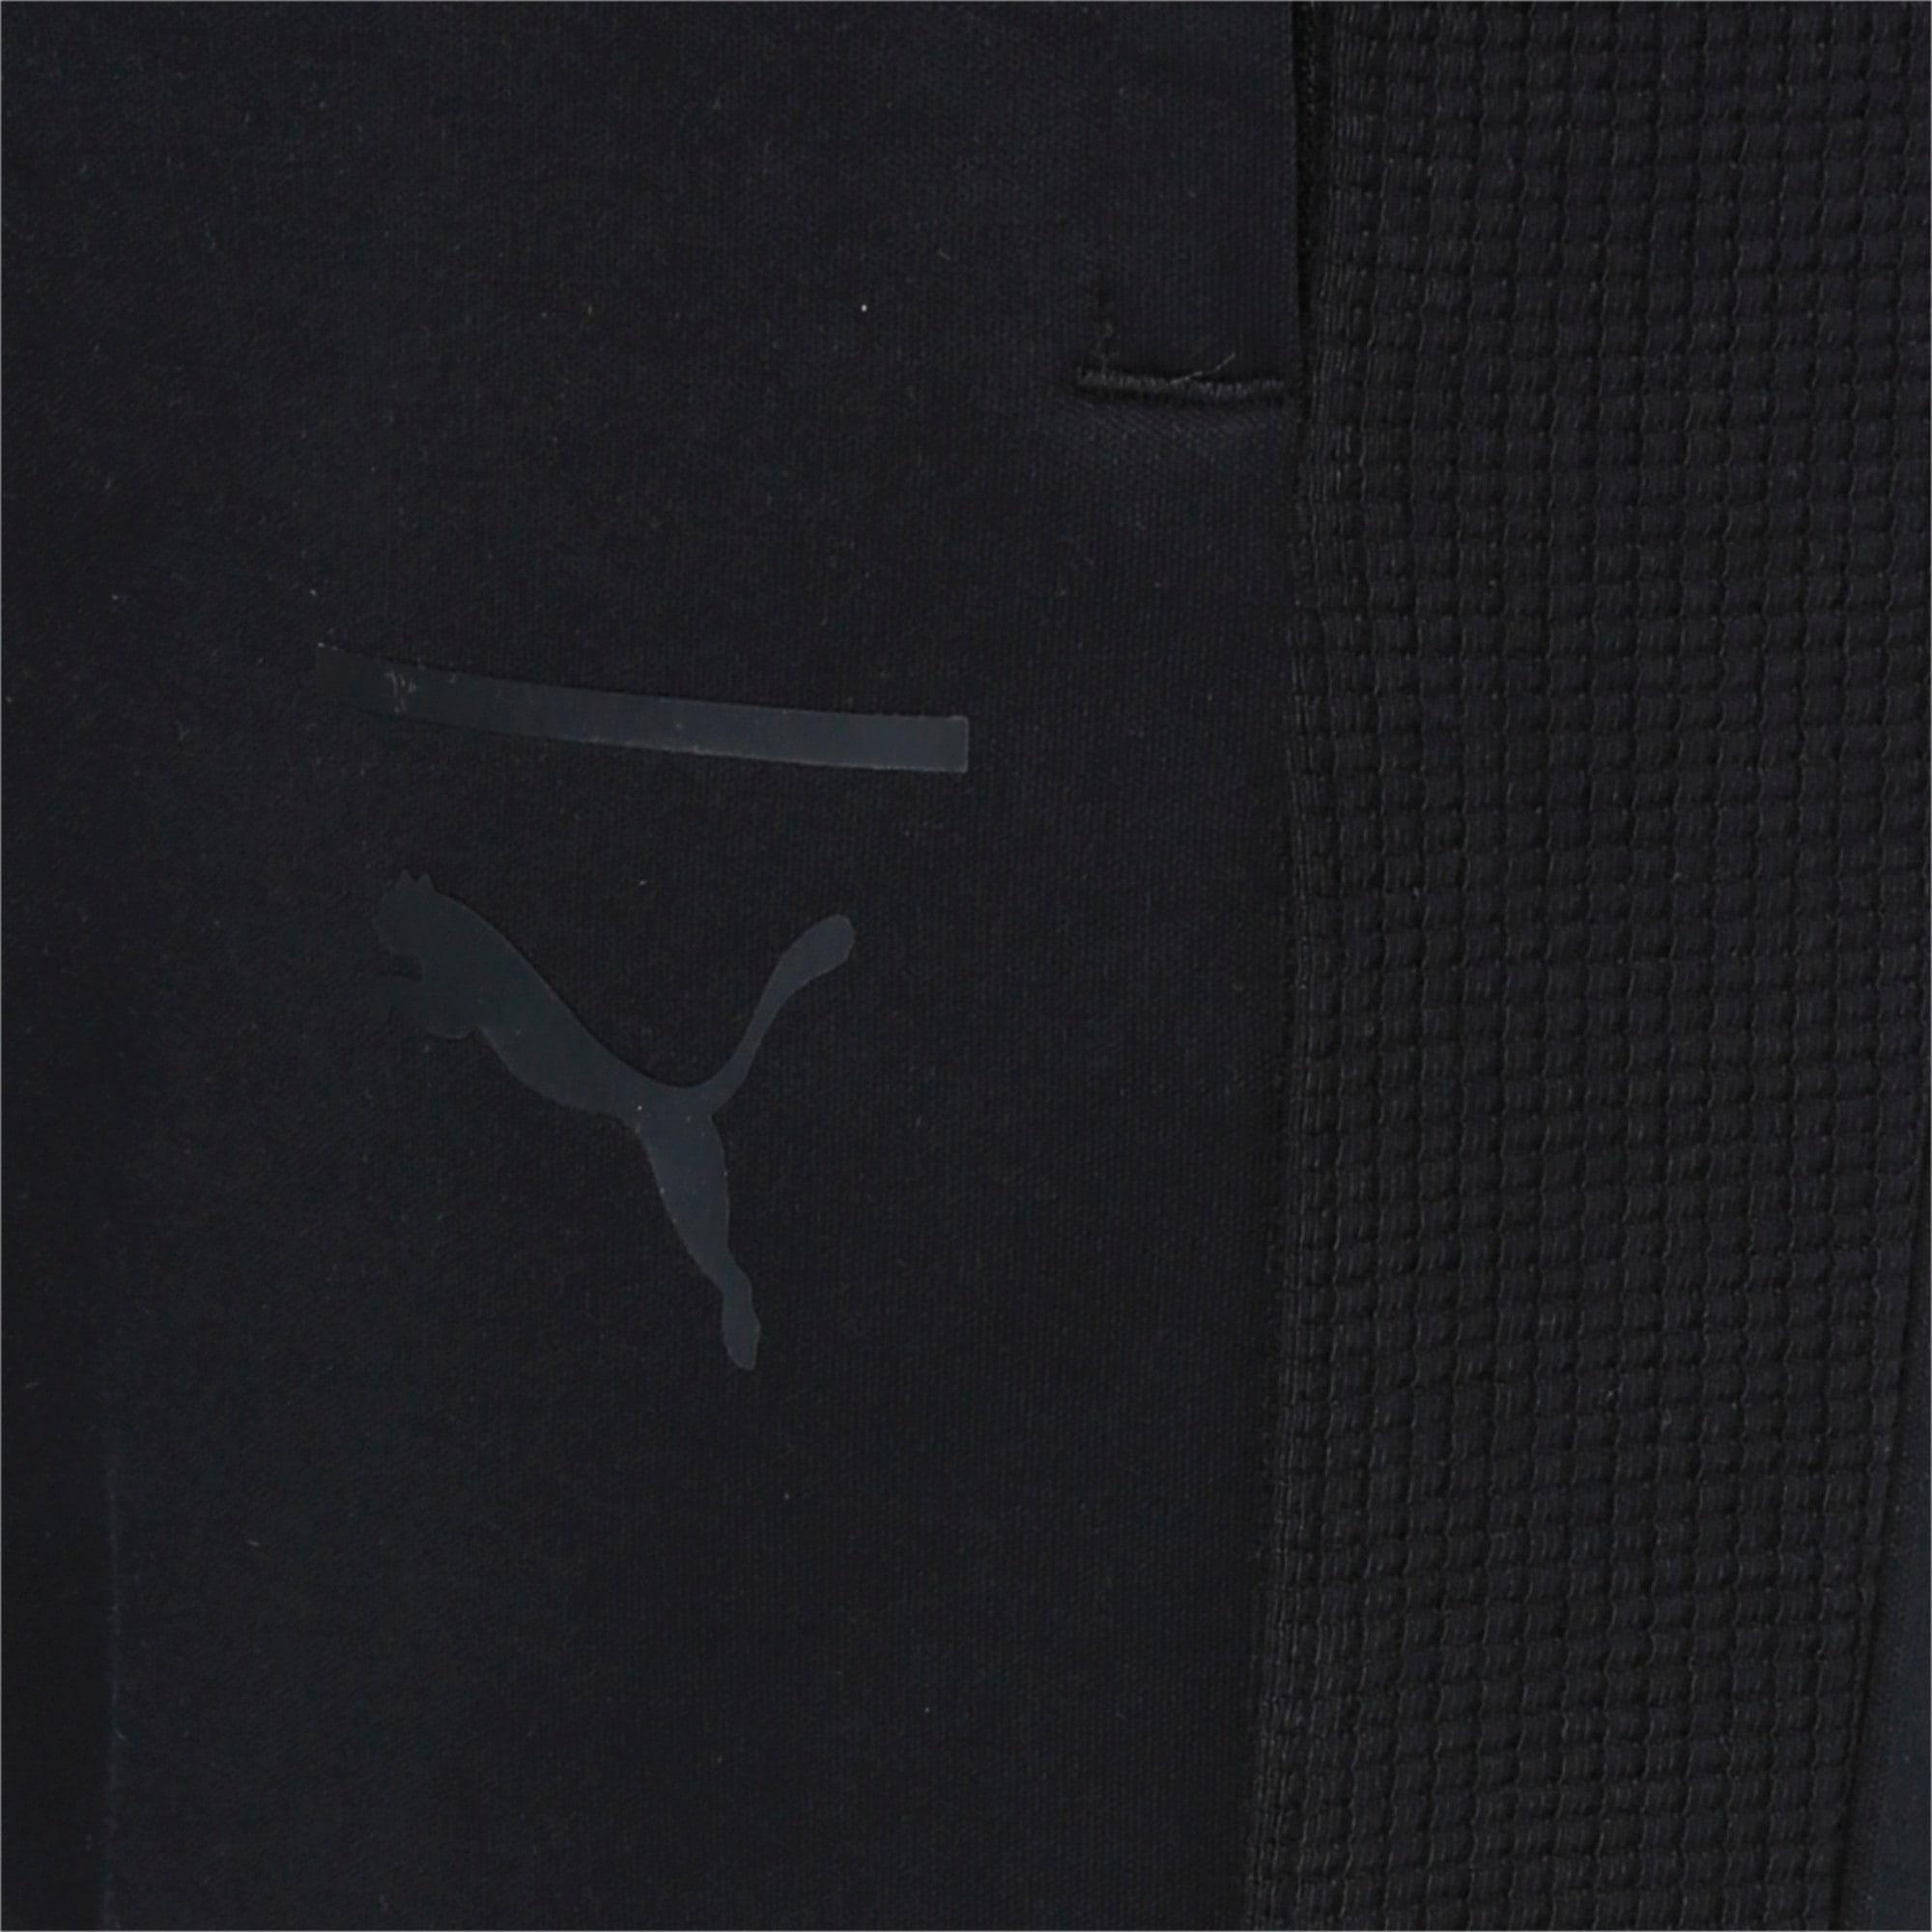 Thumbnail 6 of Pace Men's Sweatpants, Puma Black-1, medium-IND